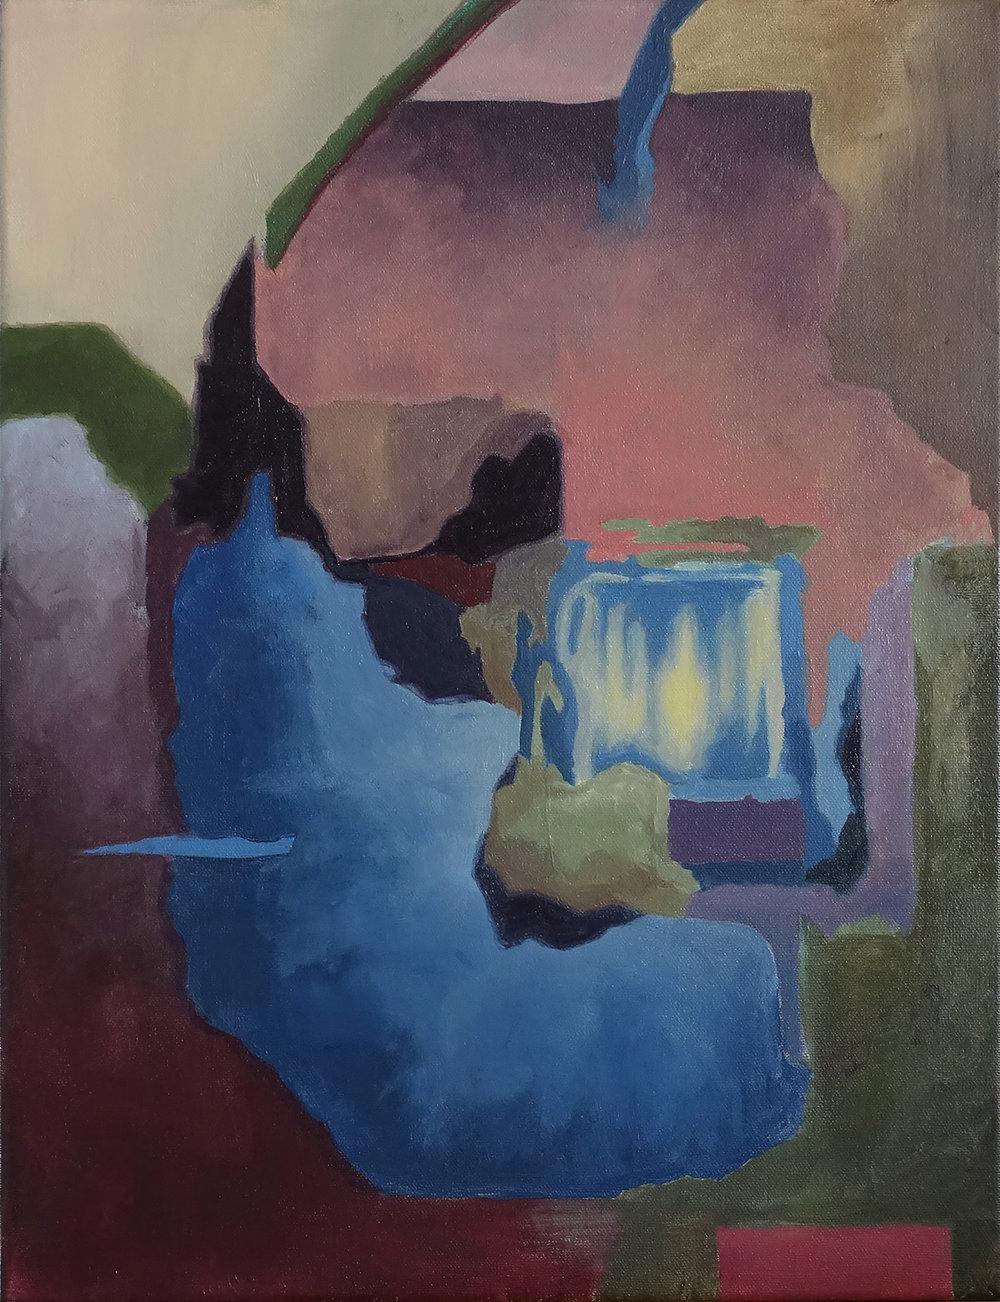 Untitled (Square), 2017